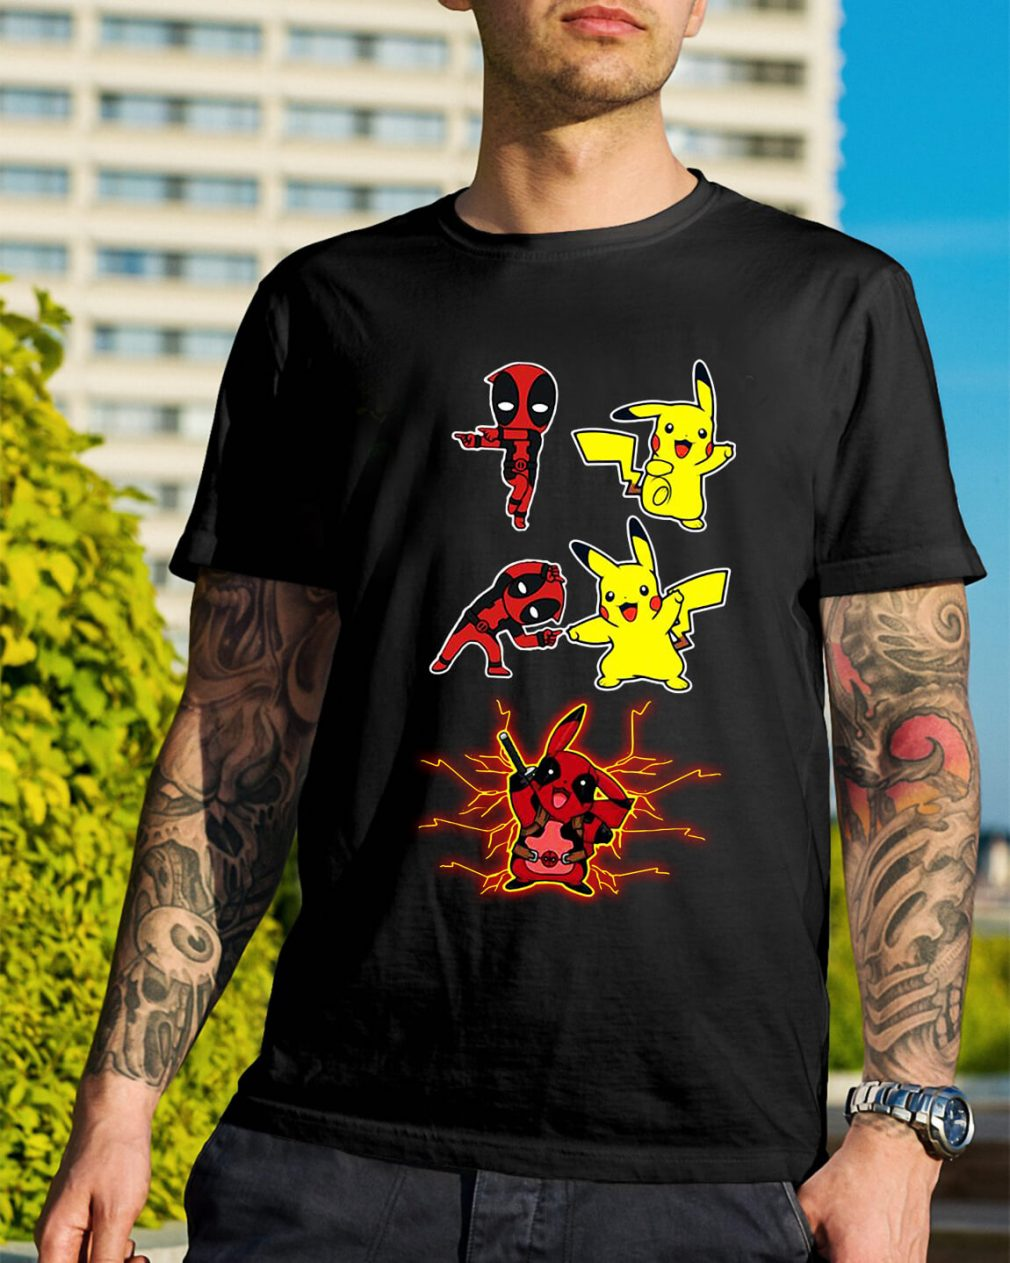 Pikapool fusion Pikachu Pokemon and Deadpool shirt